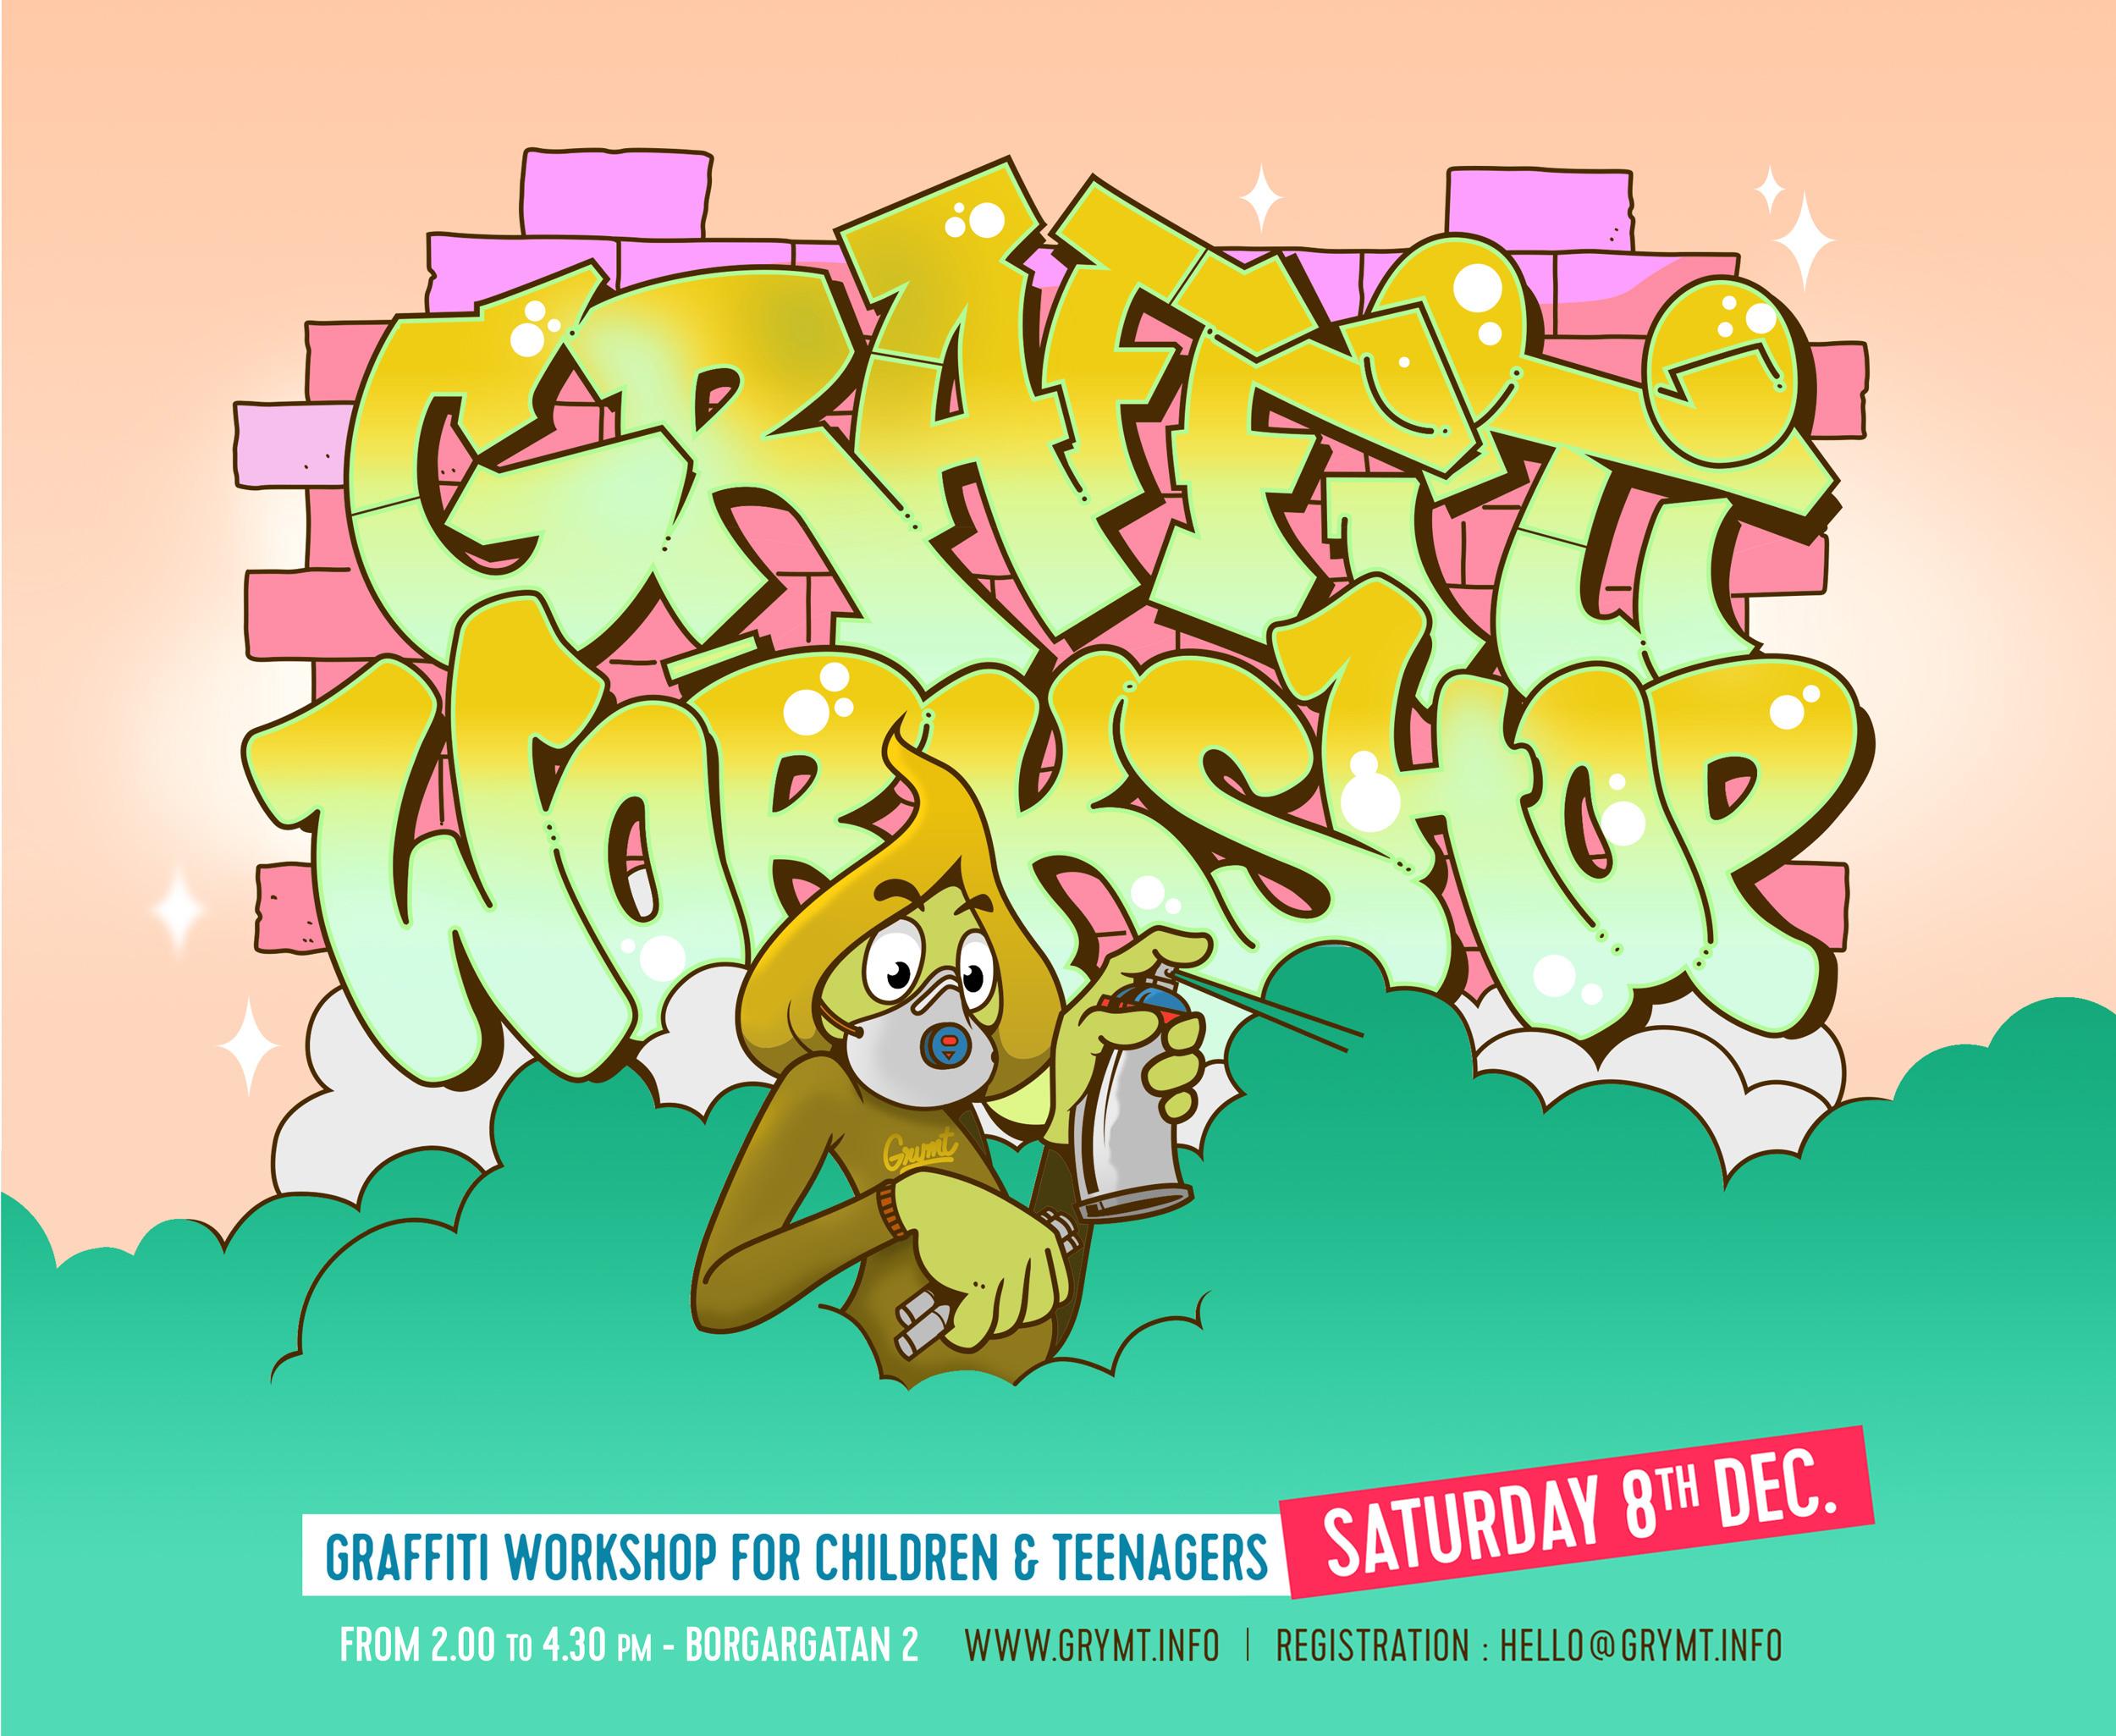 graff_workshop-8e dec.-2018-flyer.jpg